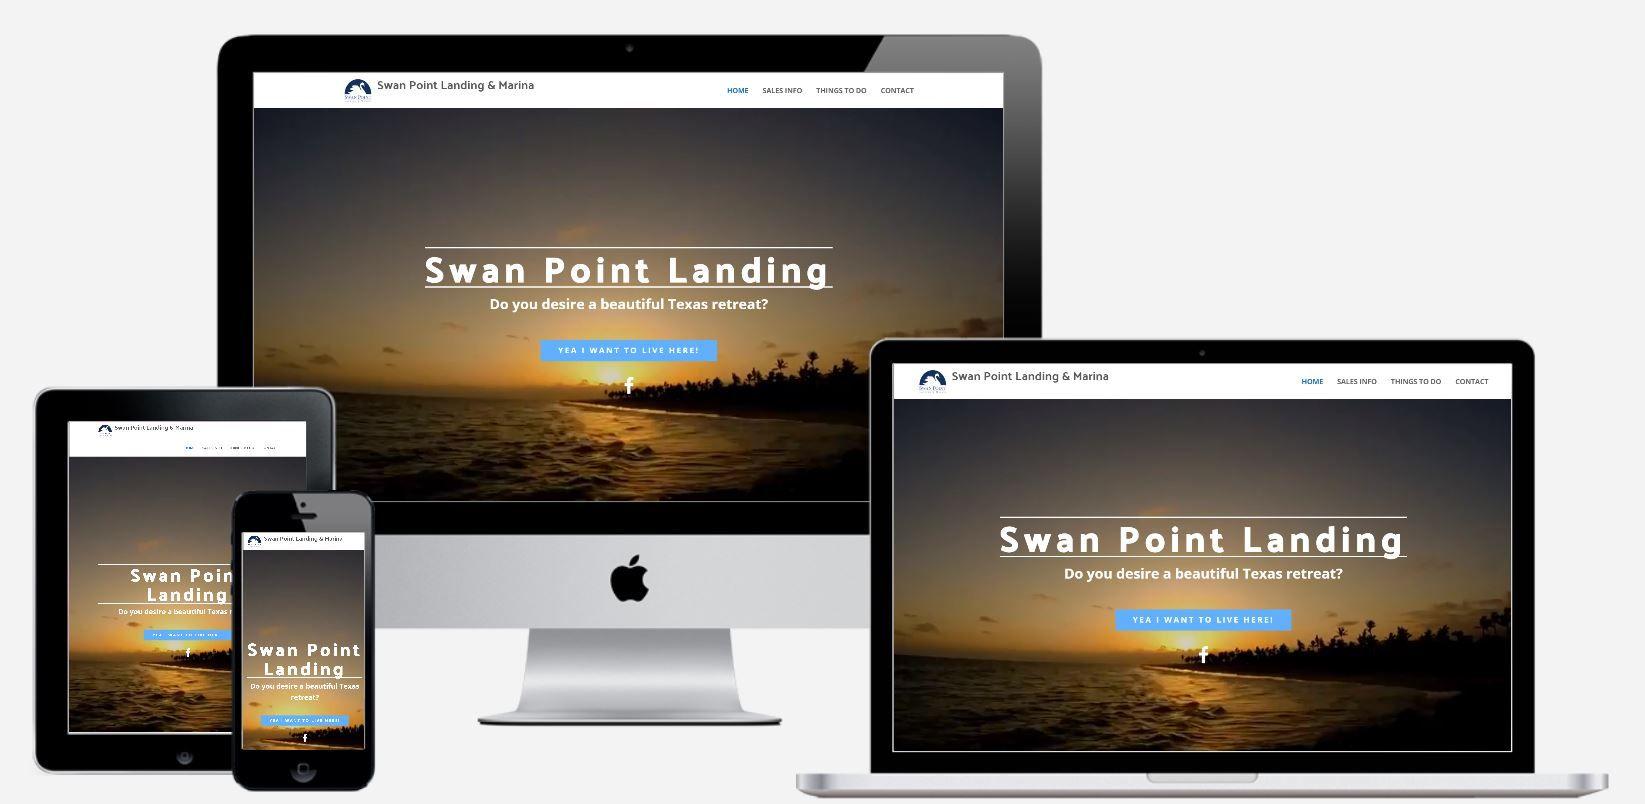 Web Design Wordpress Web Design Web Design Tips Ecommerce Website Design